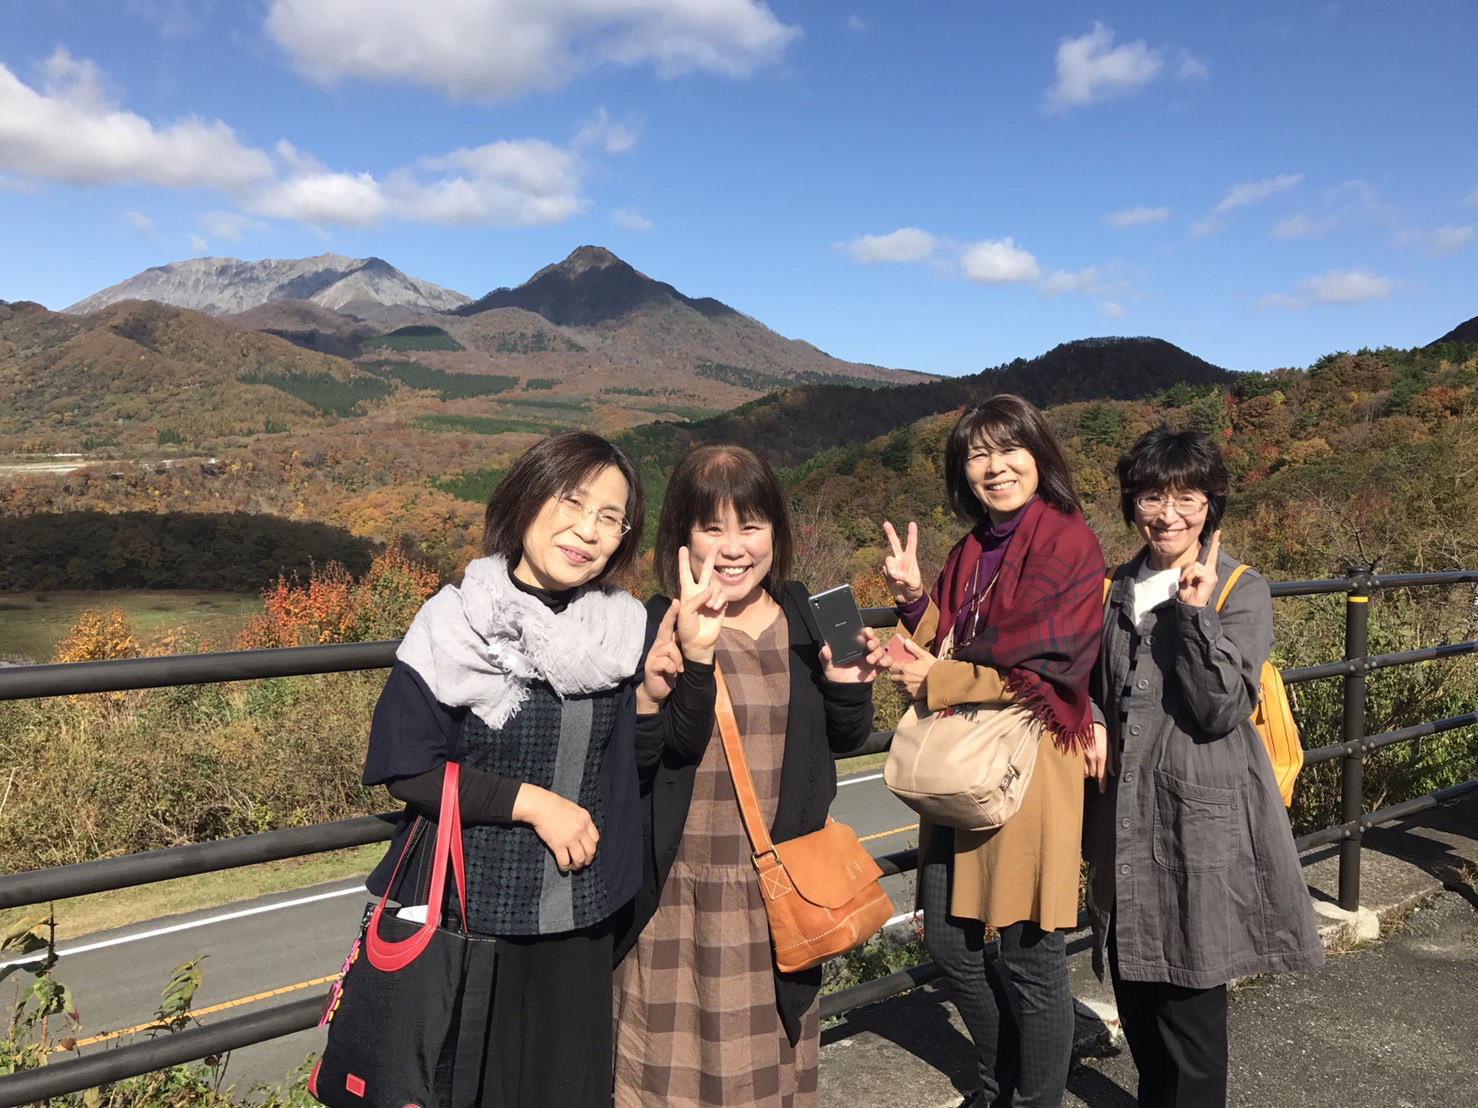 鳥取 蒜山高原と三朝温泉ツアー催行!